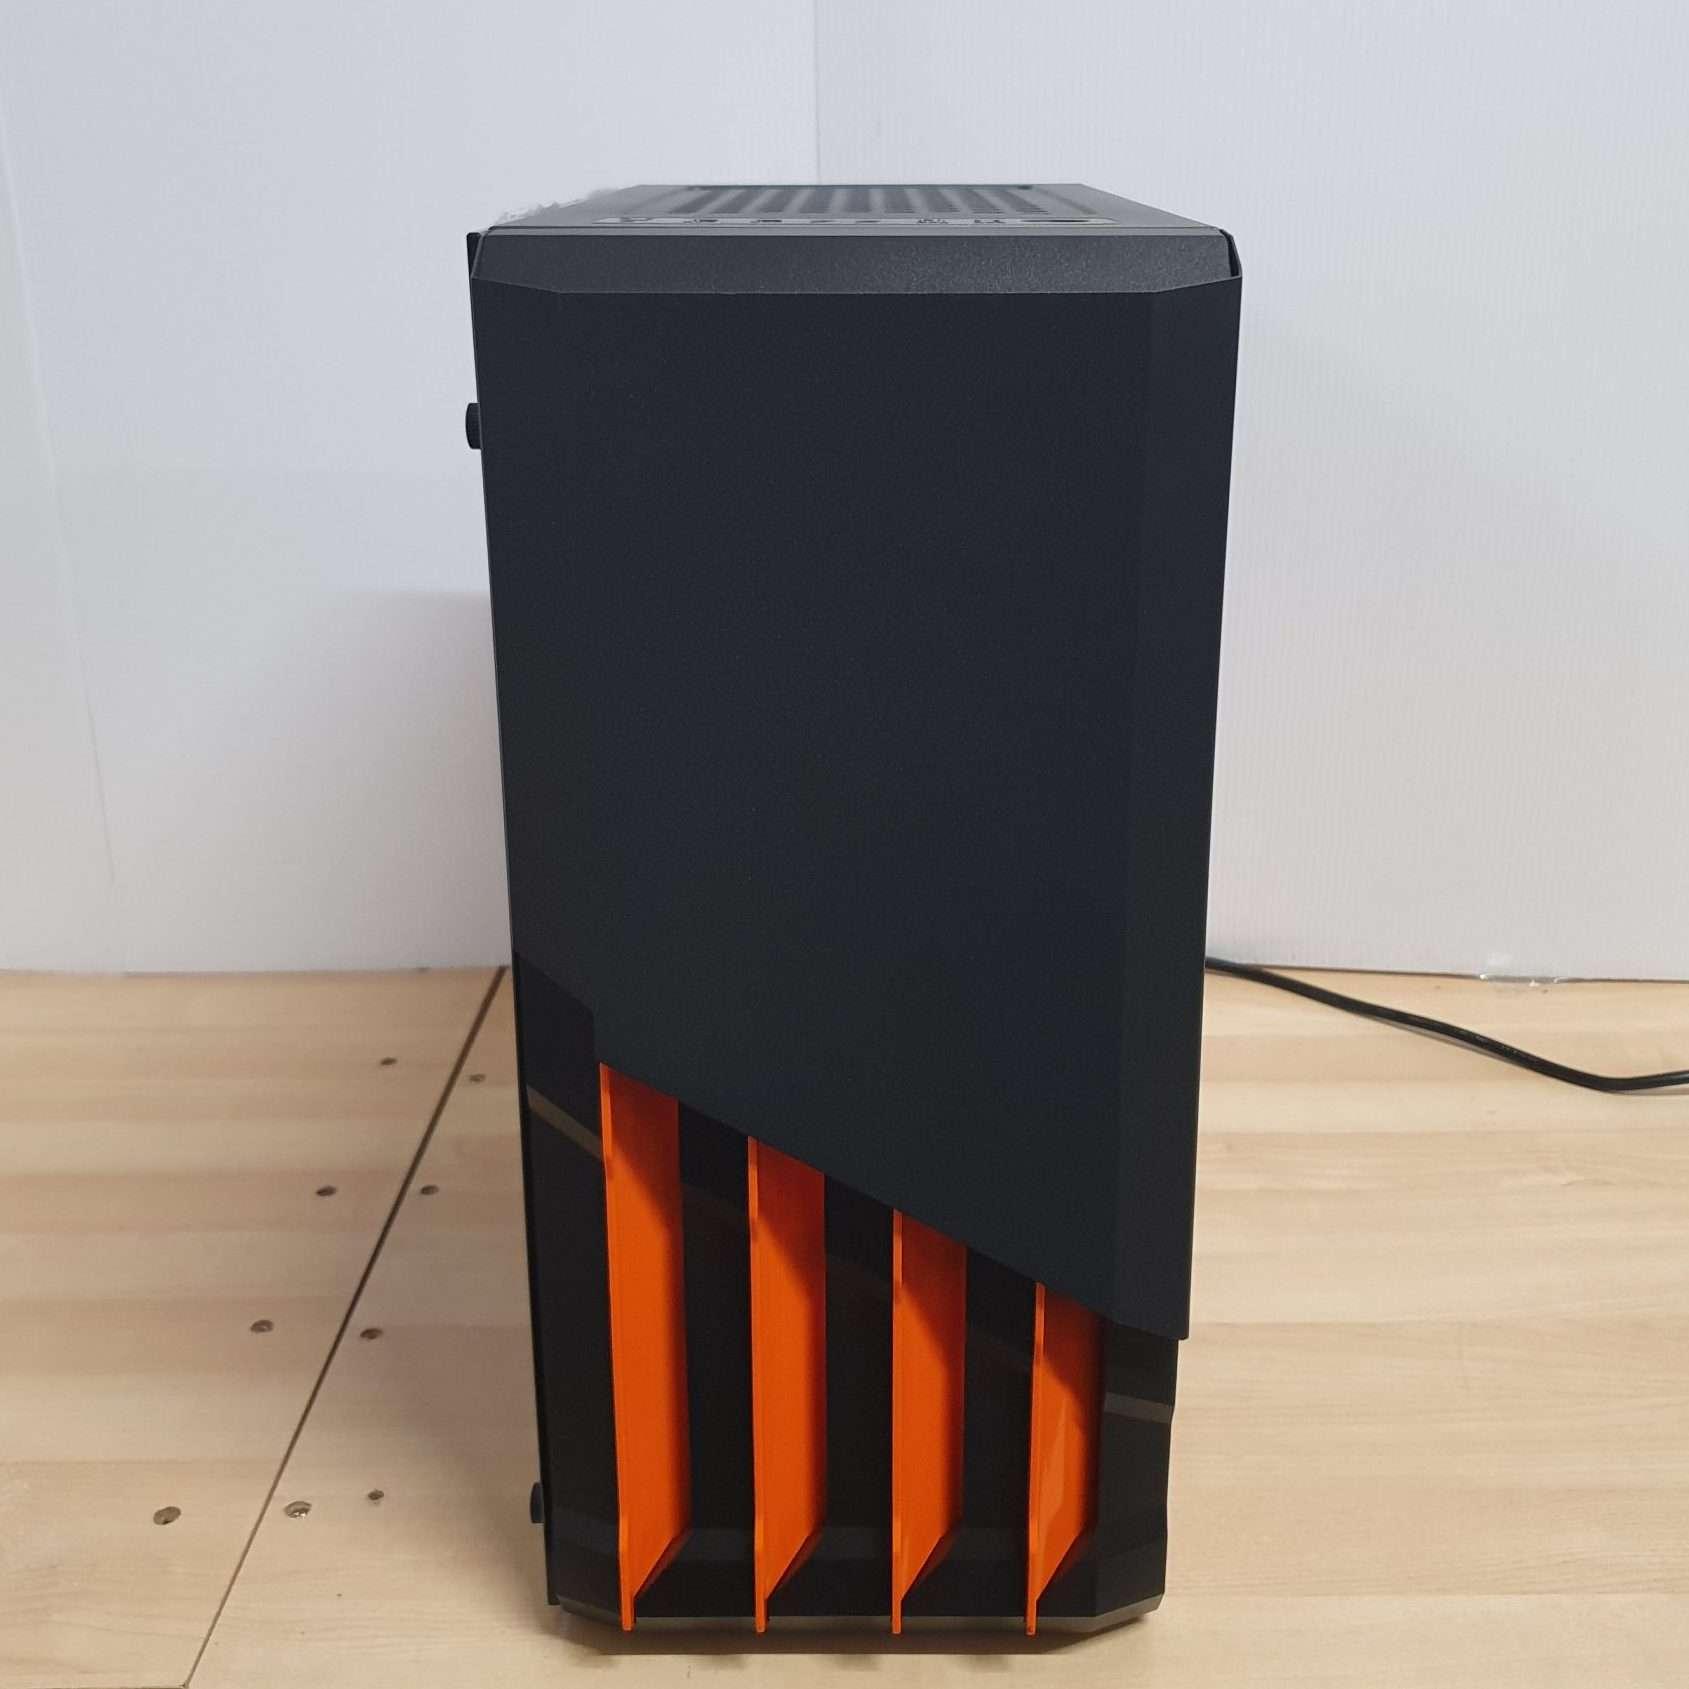 Havoc Gaming PC